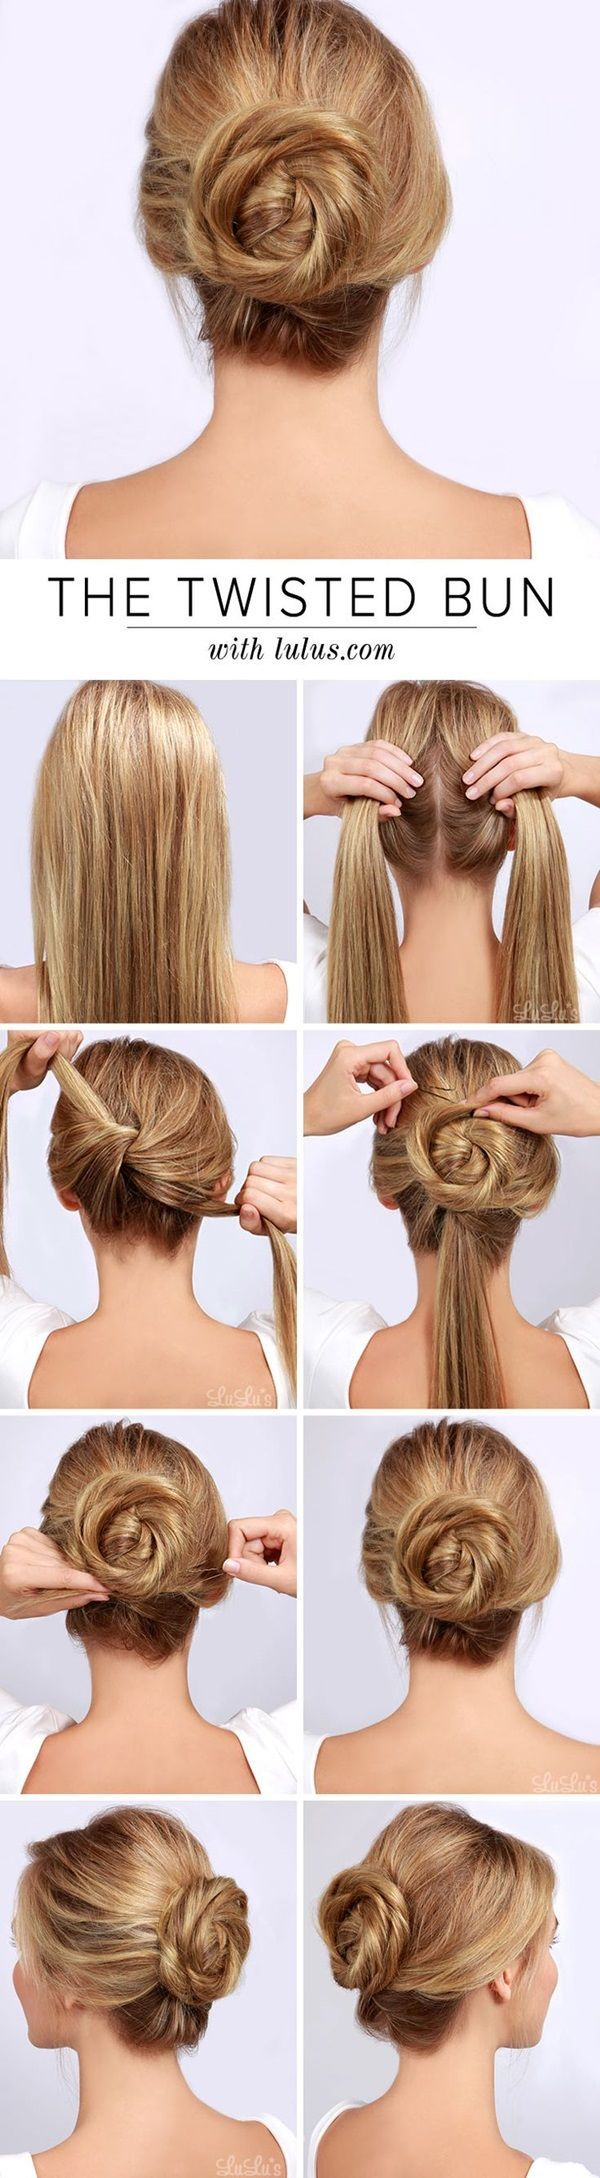 Fabulous 1000 Ideas About Everyday Hairstyles On Pinterest Evening Short Hairstyles Gunalazisus